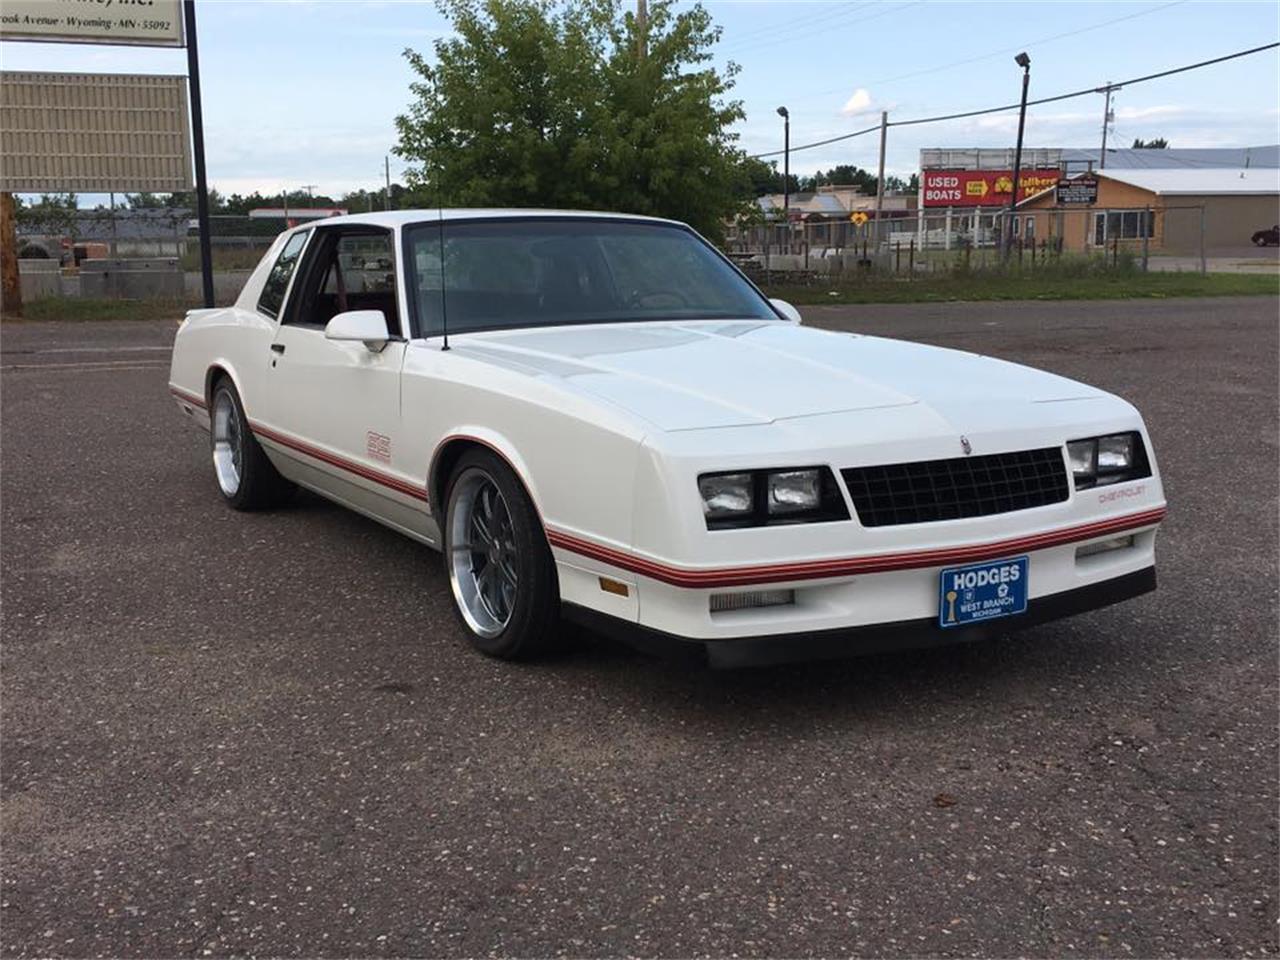 Ss Monte Carlo >> 1988 Chevrolet Monte Carlo Ss For Sale Classiccars Com Cc 1171545